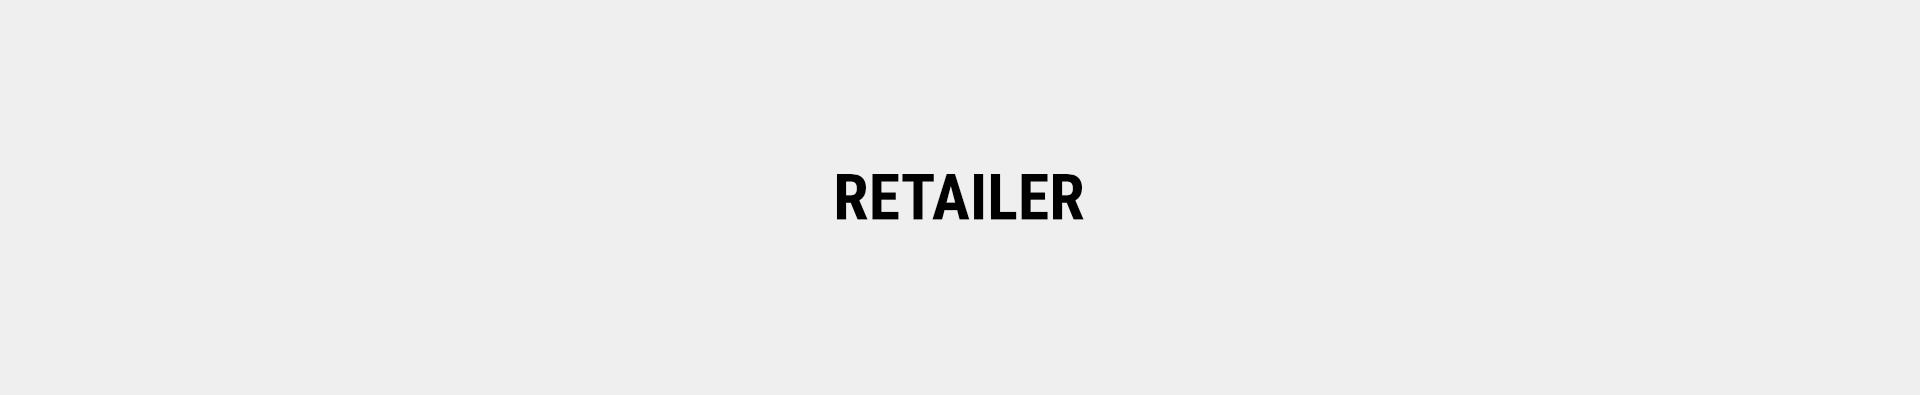 burggrafburggraf_aktuelles_retailer